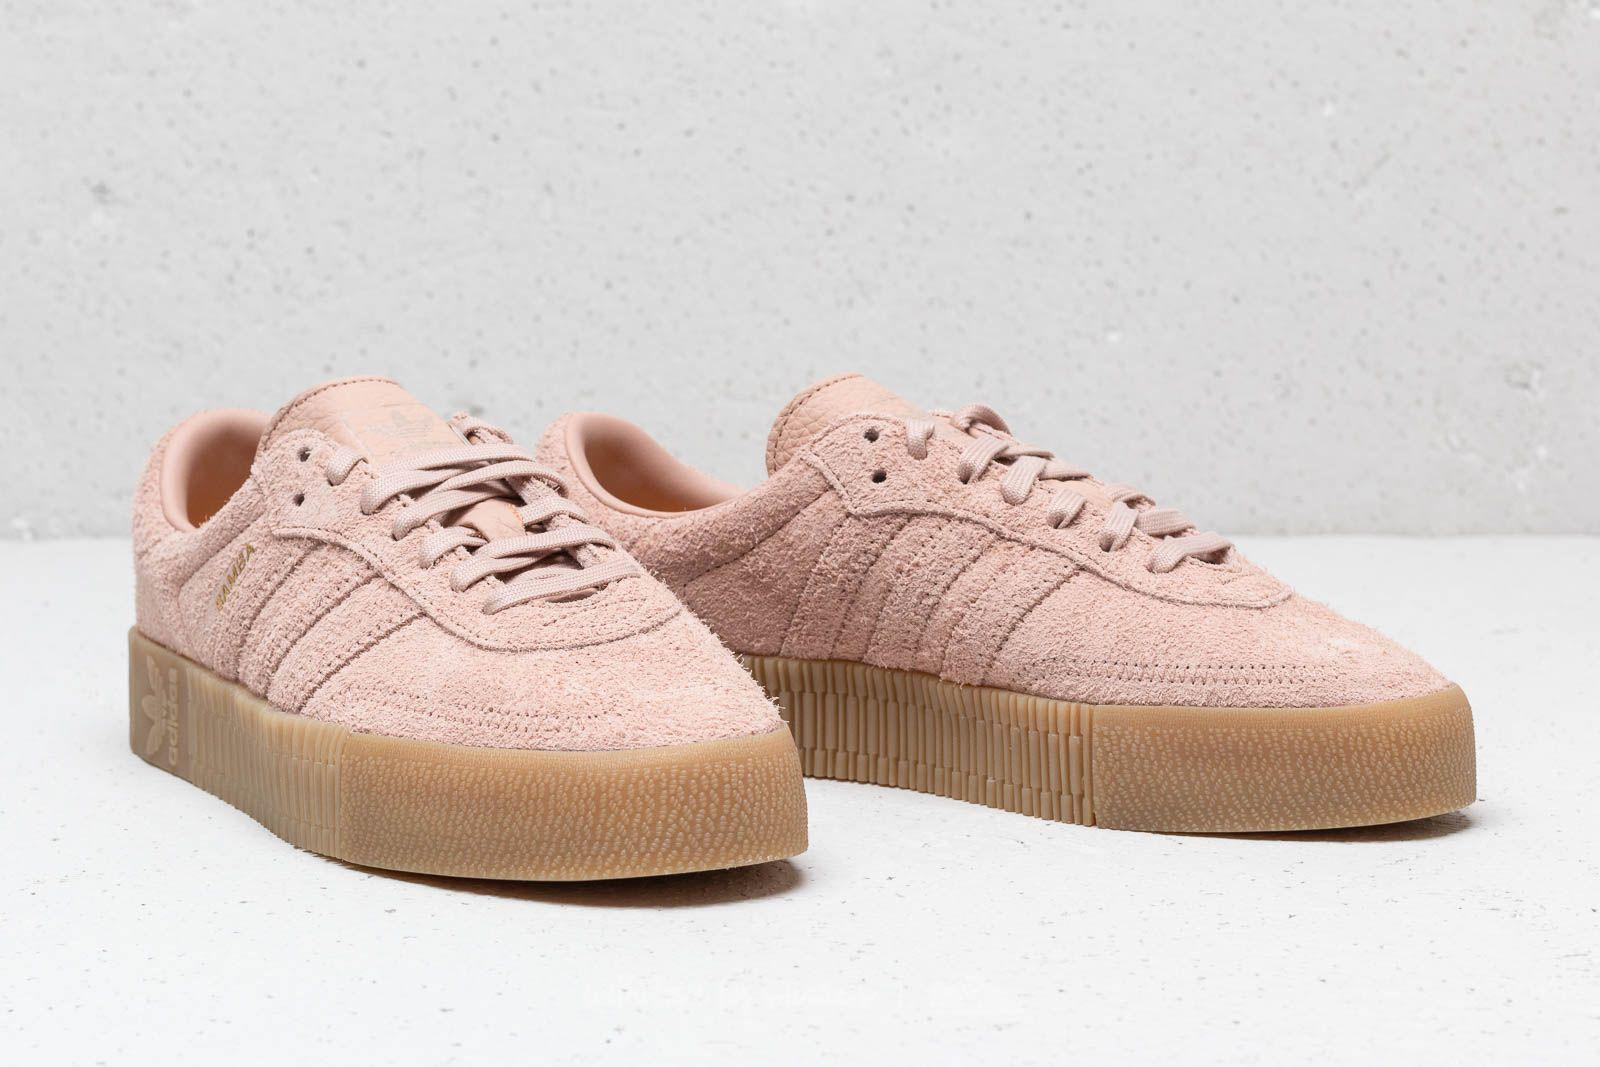 adidas Originals Suede Adidas Sambarose